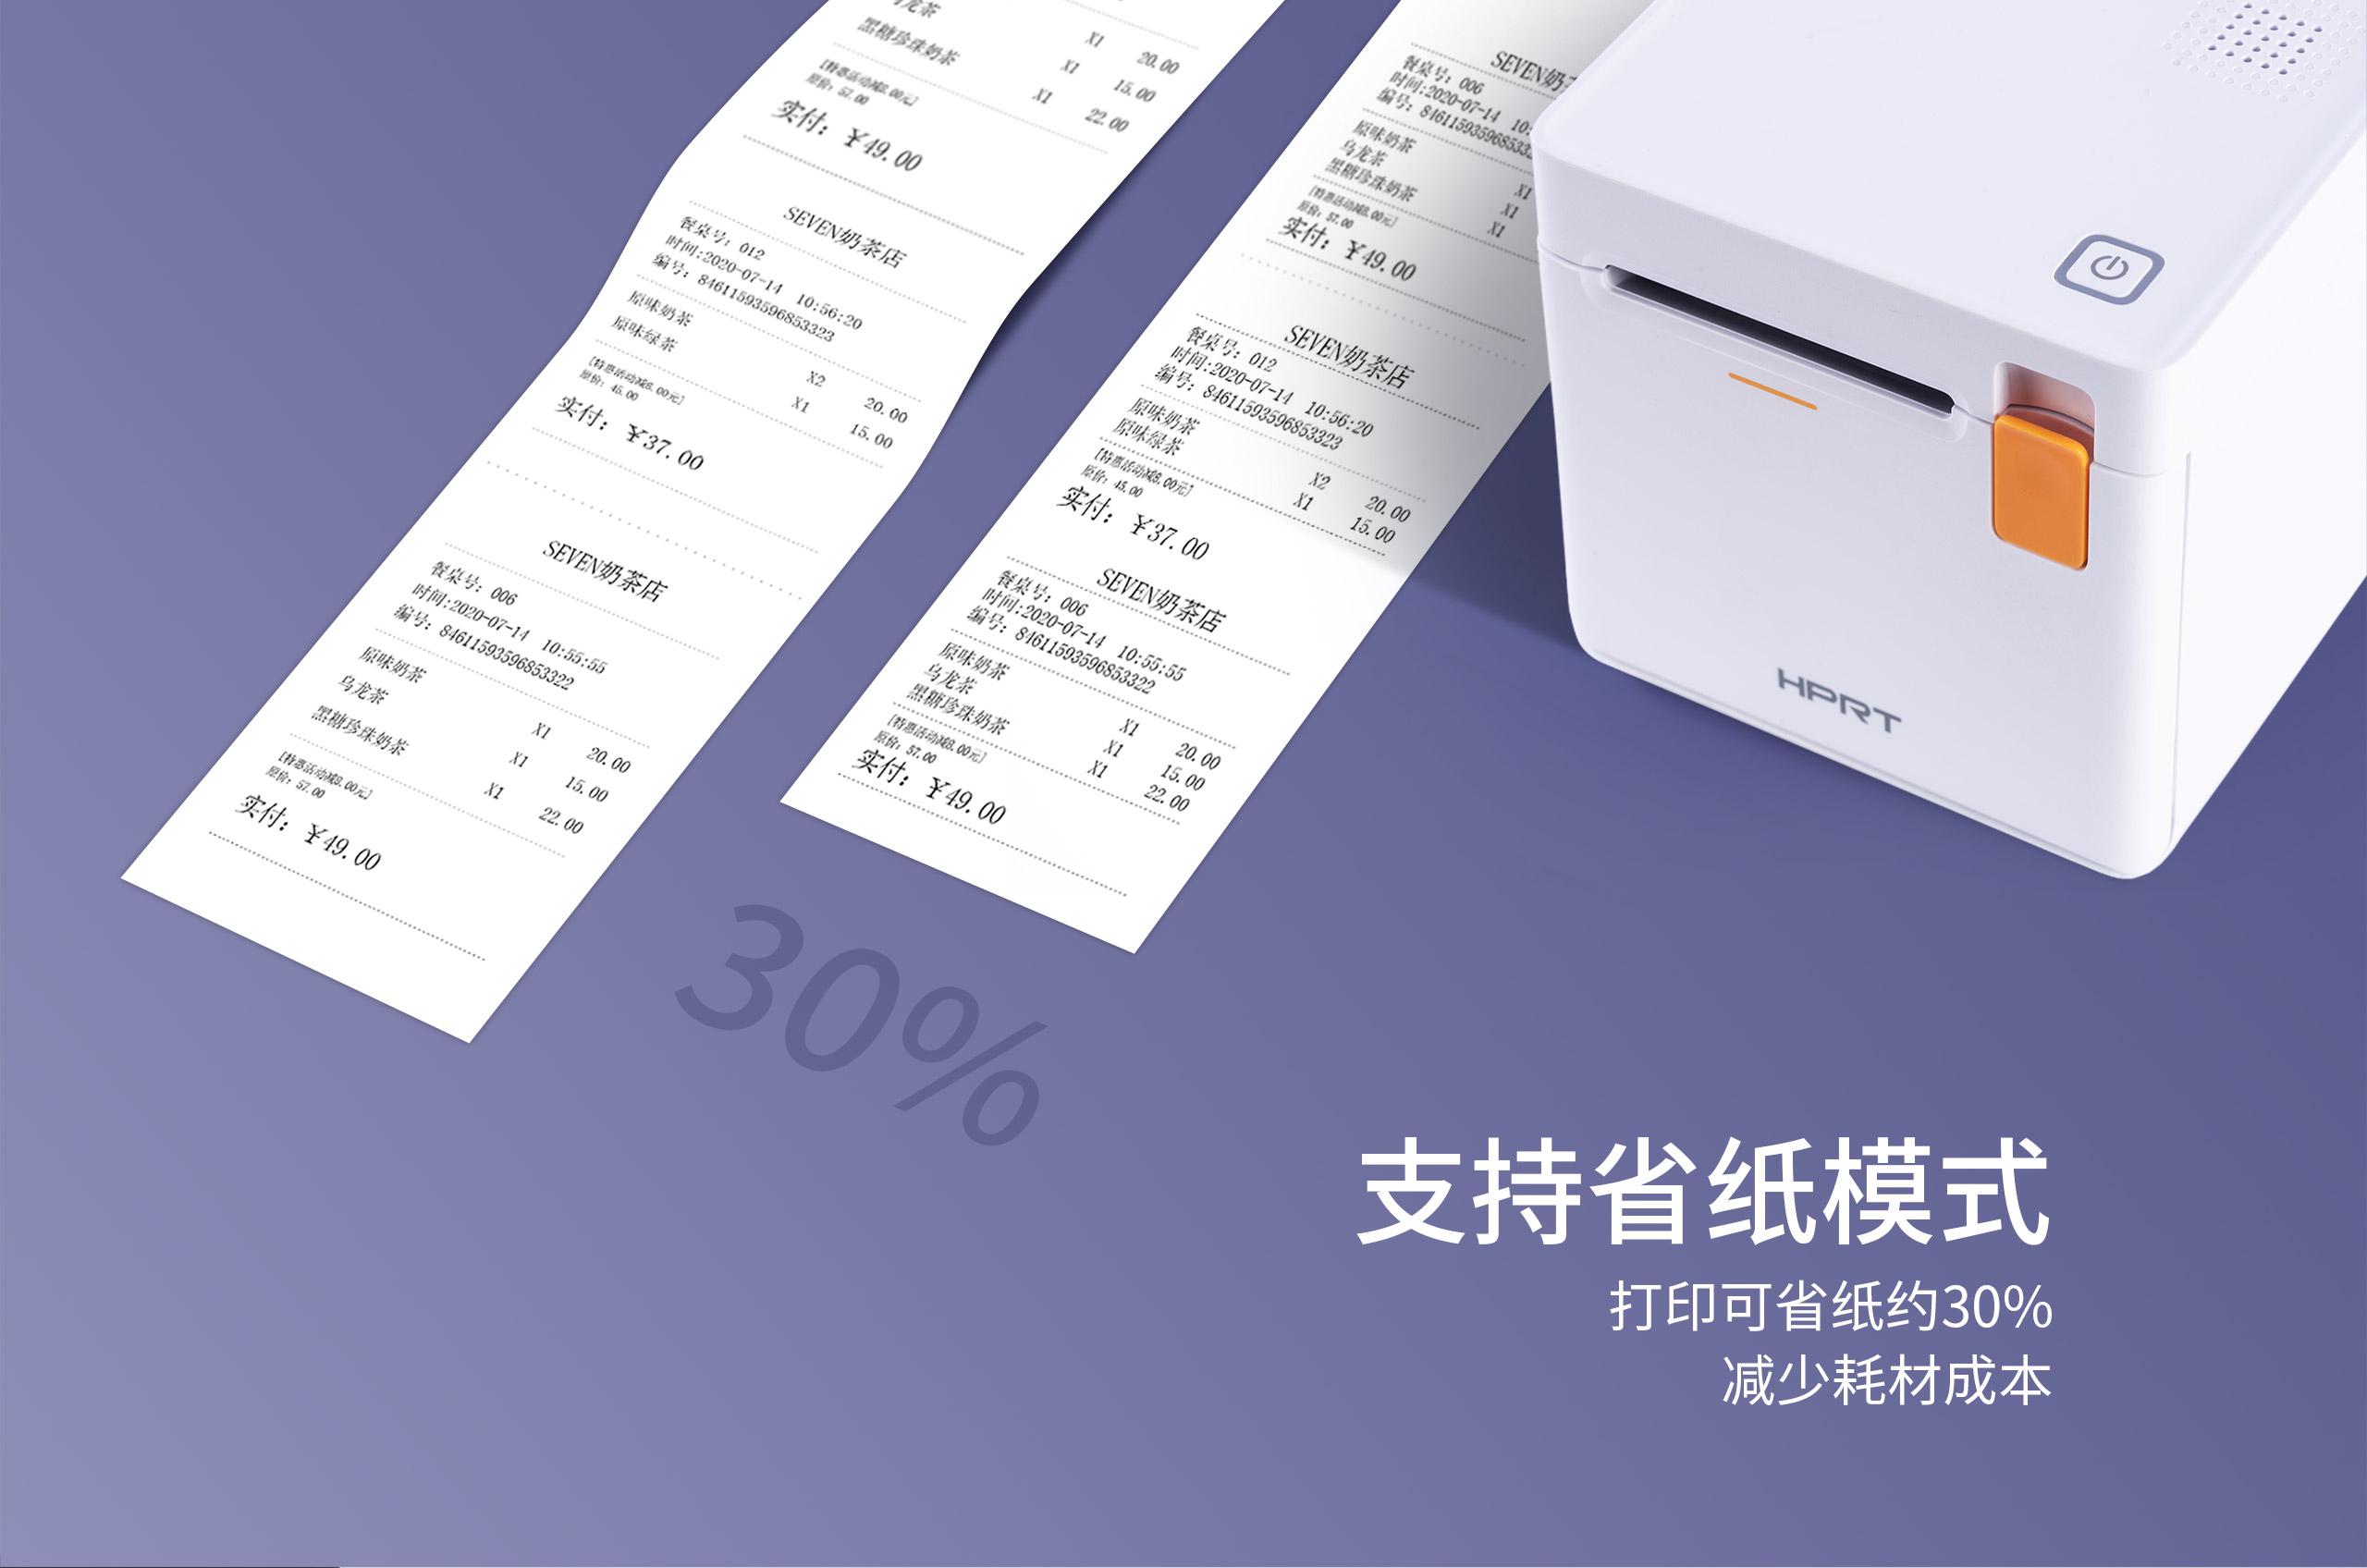 TP585/TP585L热敏打印机  第8张